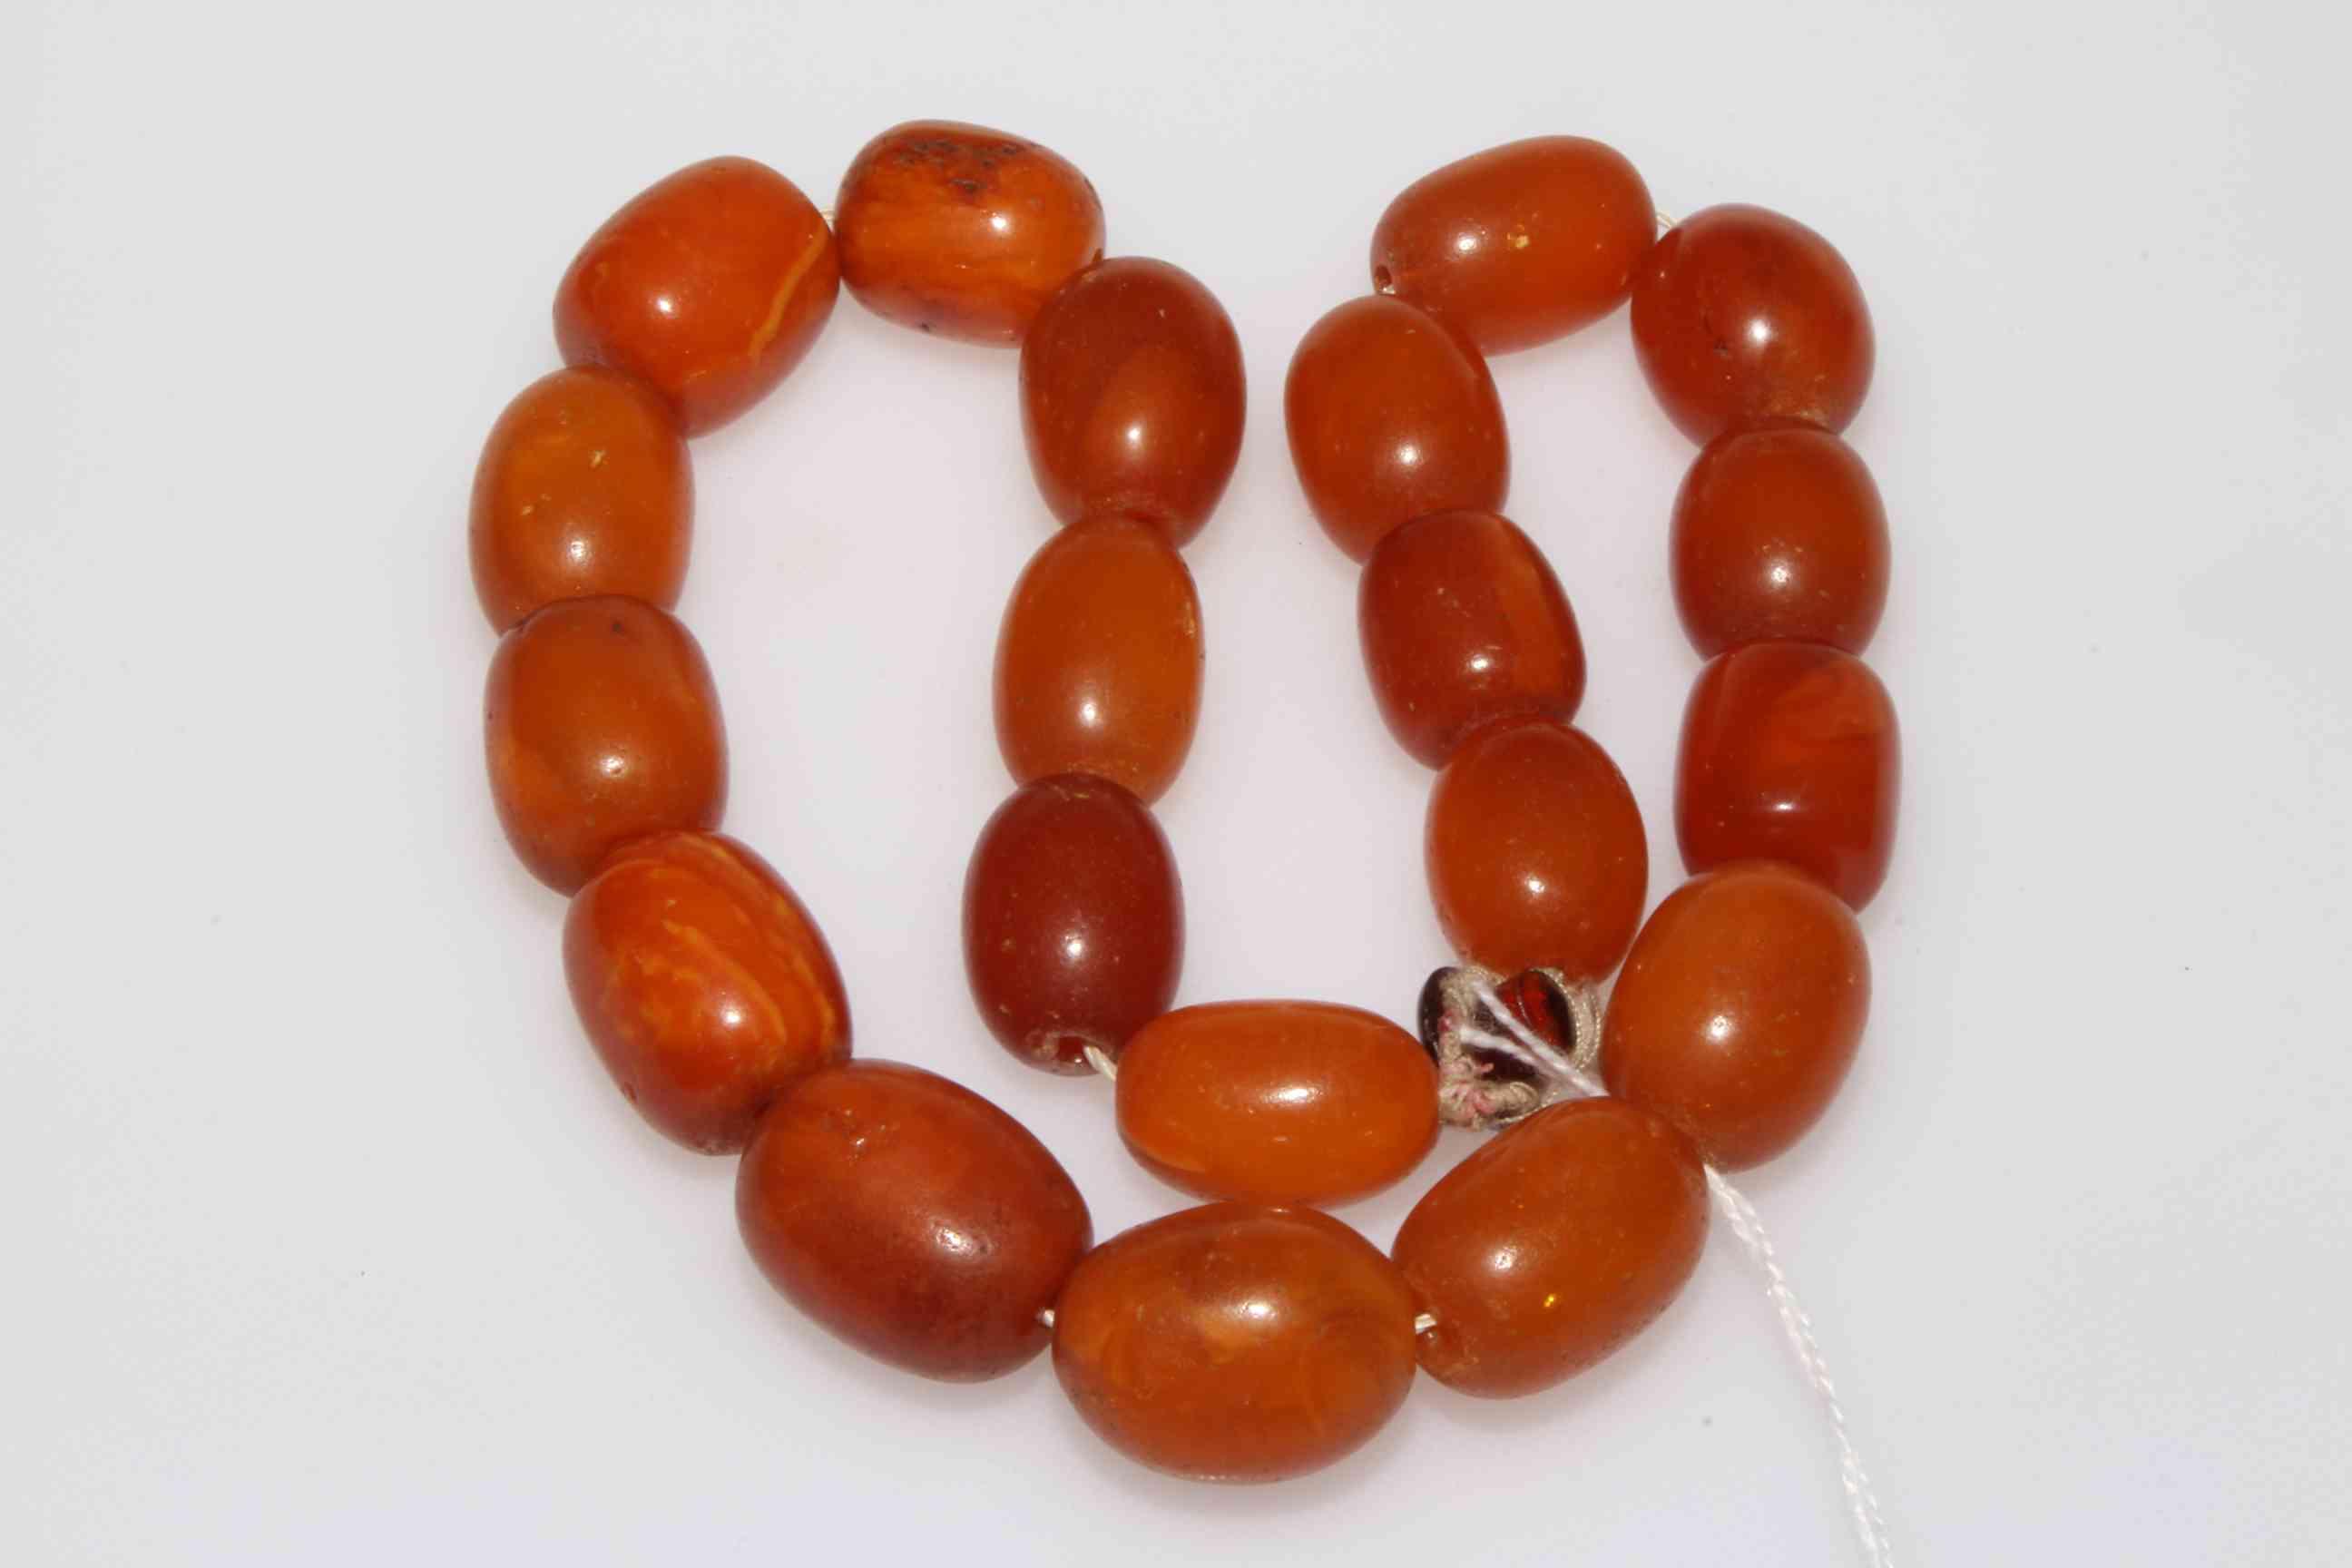 Lot 230 - Necklace of twenty large amber beads, 99 grams.